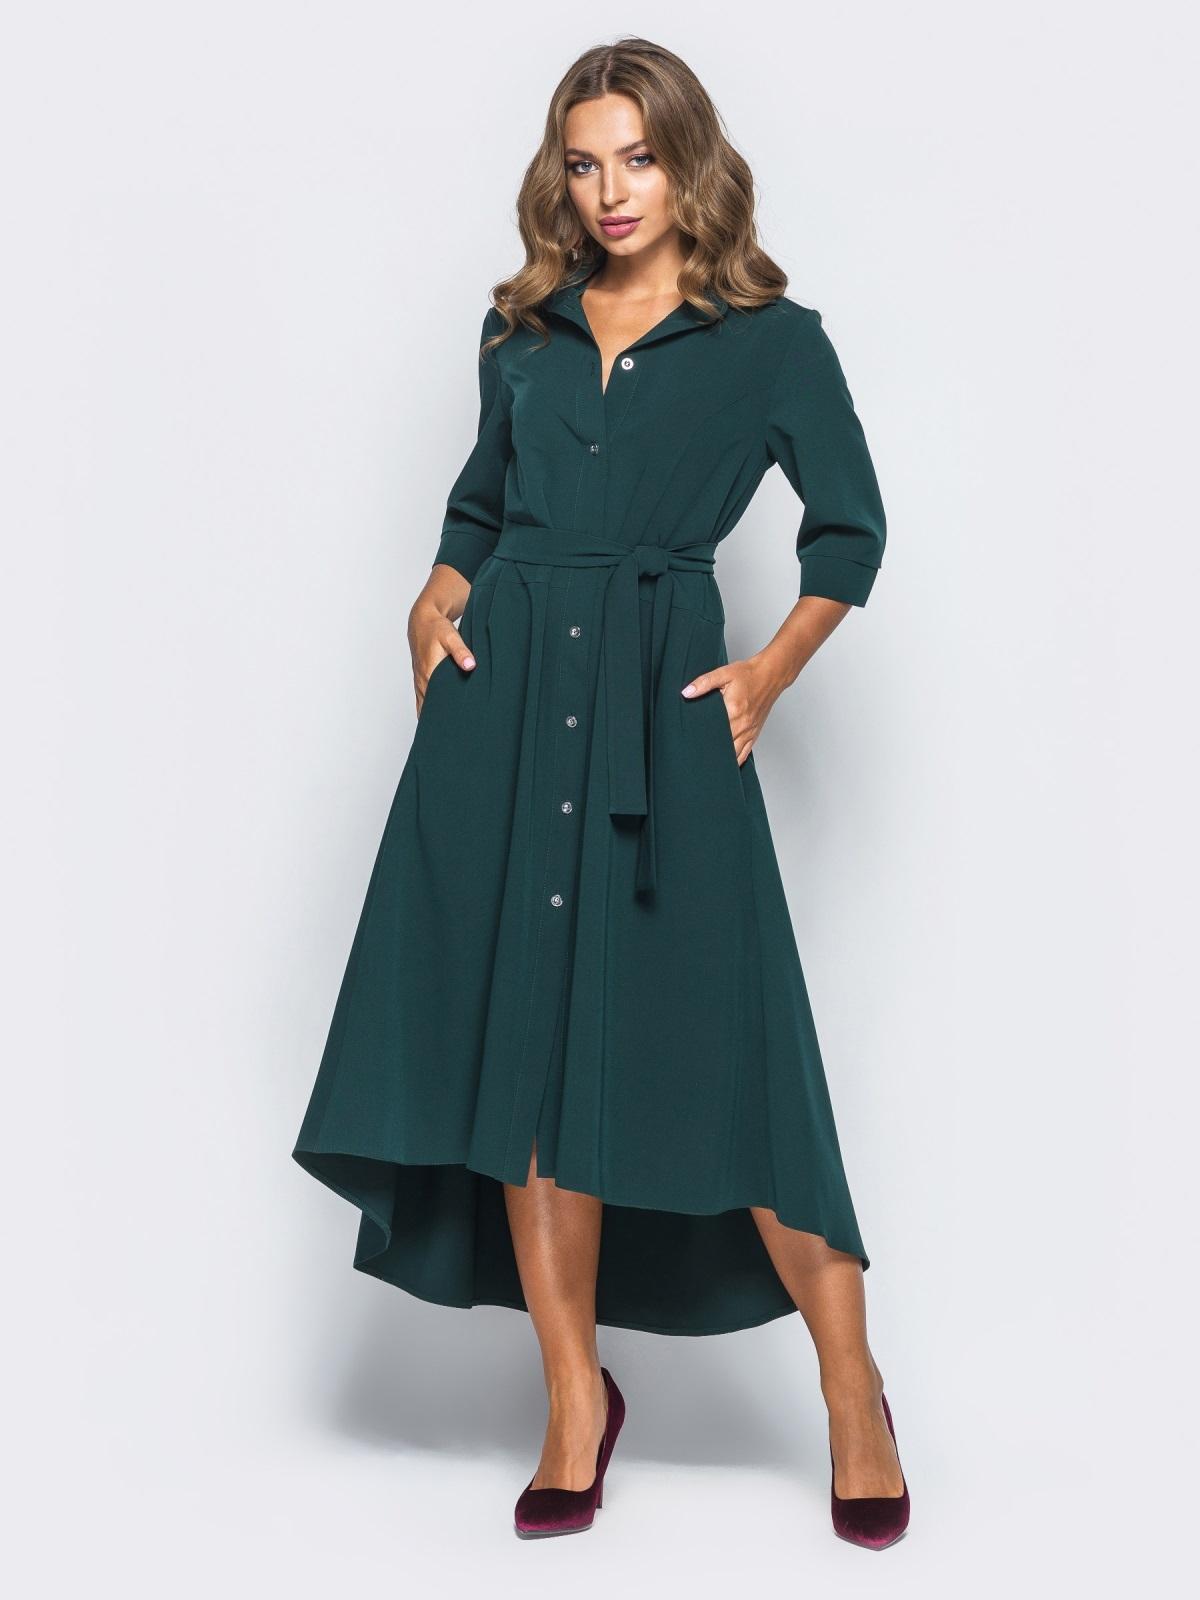 Платье-рубашка тёмно-зелёного цвета со шлейфом - 16447, фото 1 – интернет-магазин Dressa